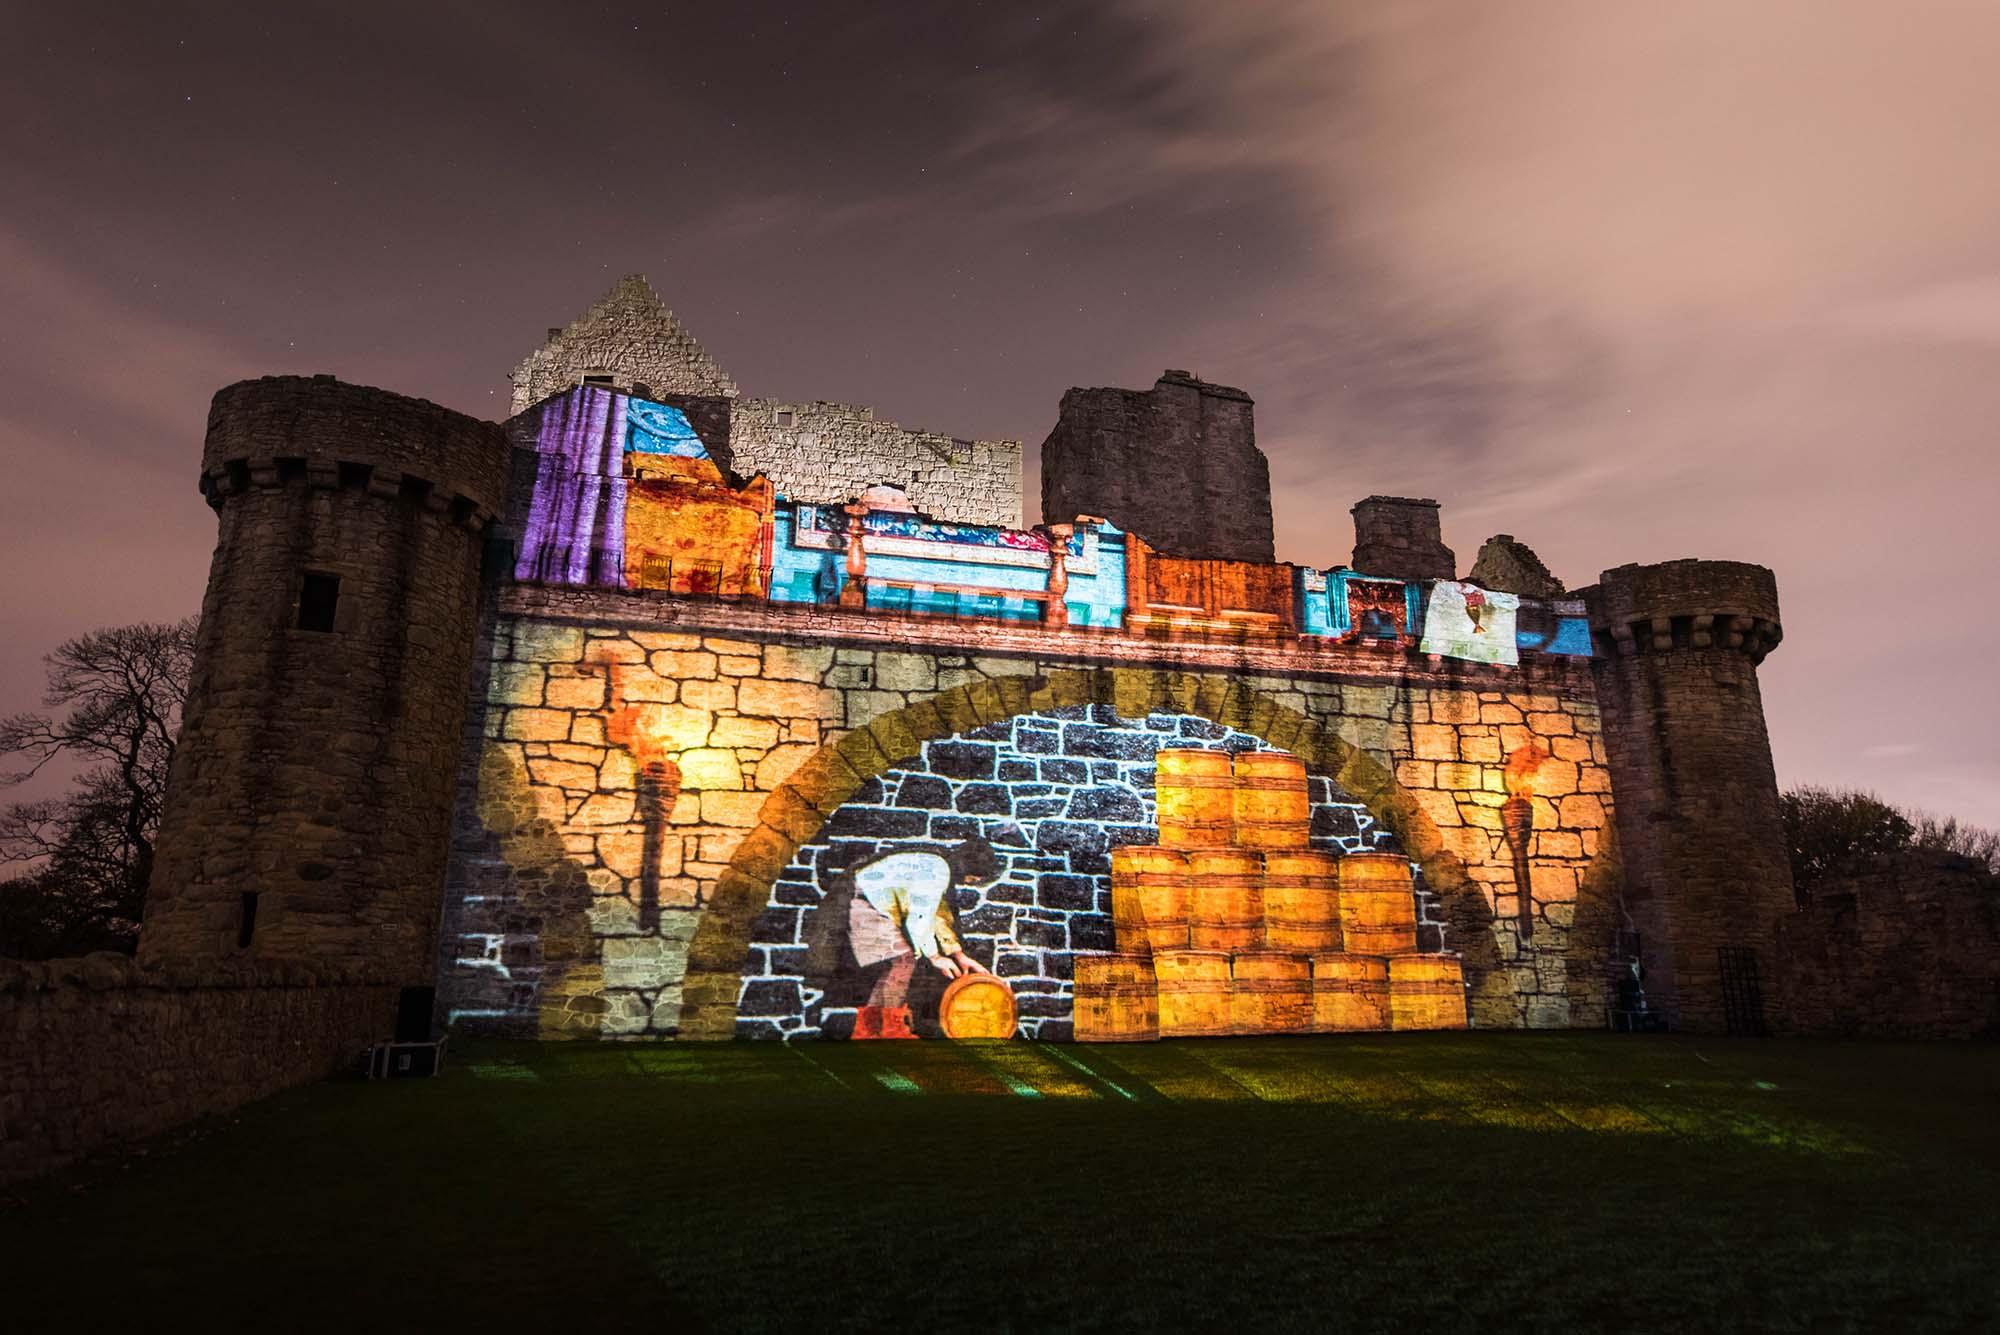 Spotlight on Mary, Projection Light Walk, in Craigmillar East yard